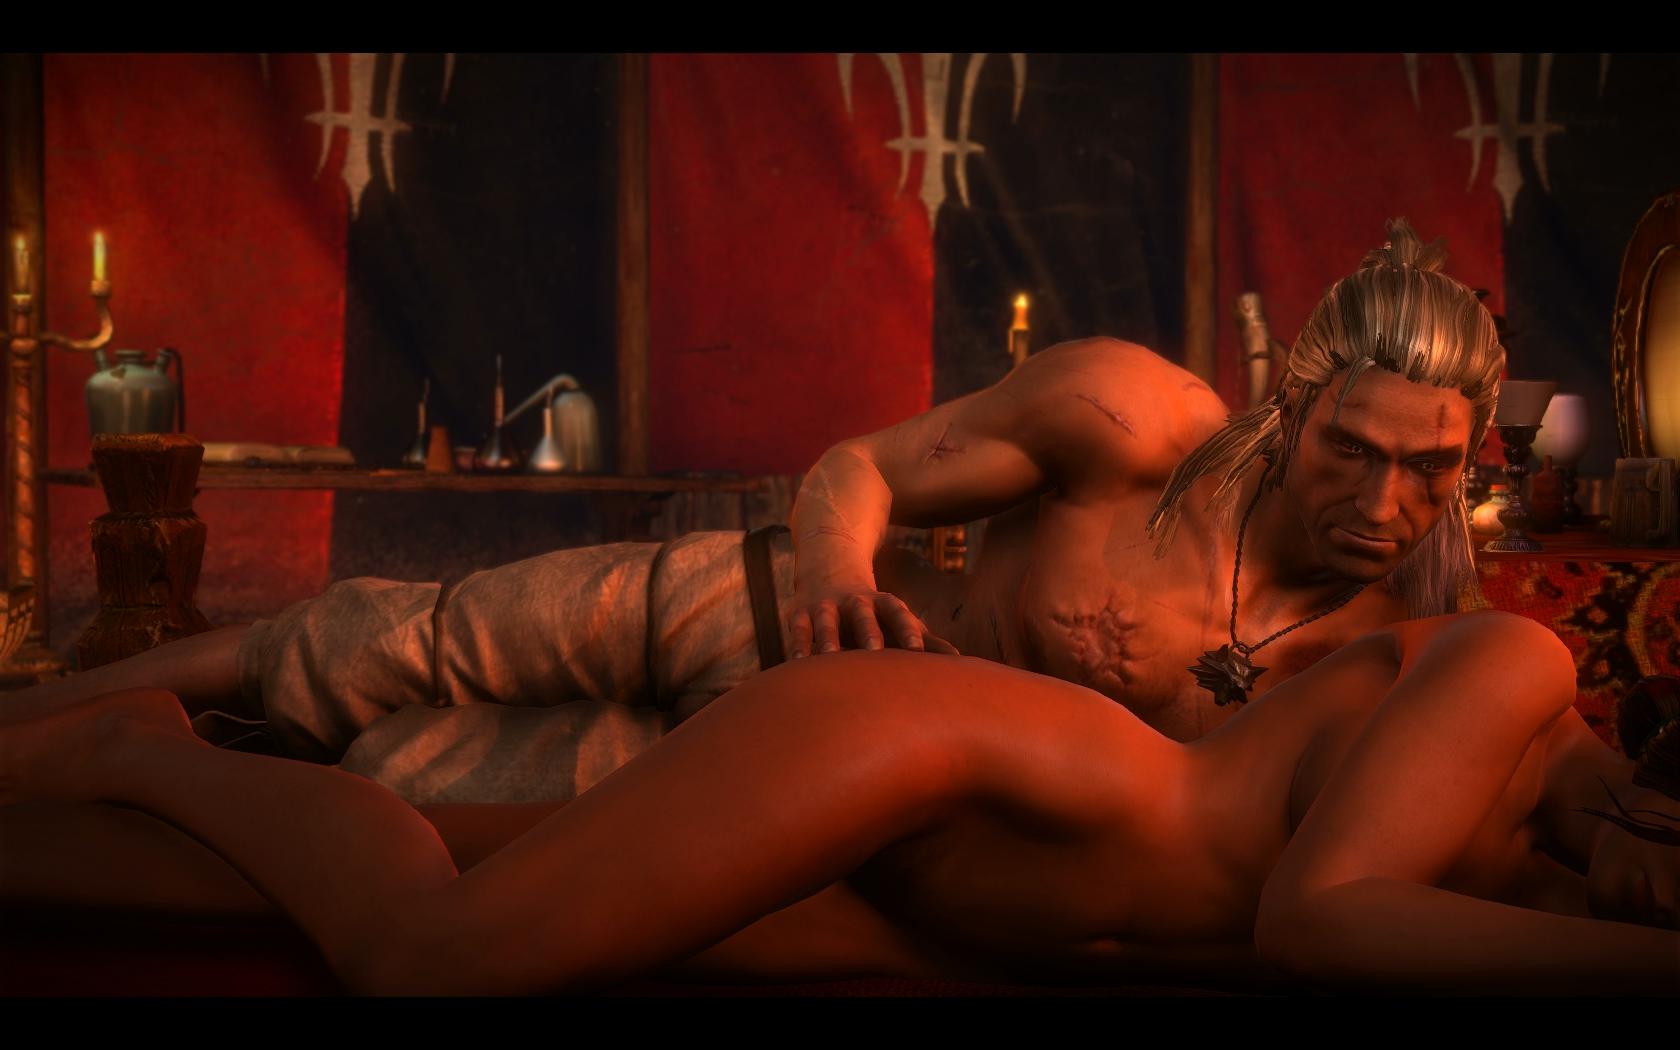 Rogue assassin nude erotic cuties